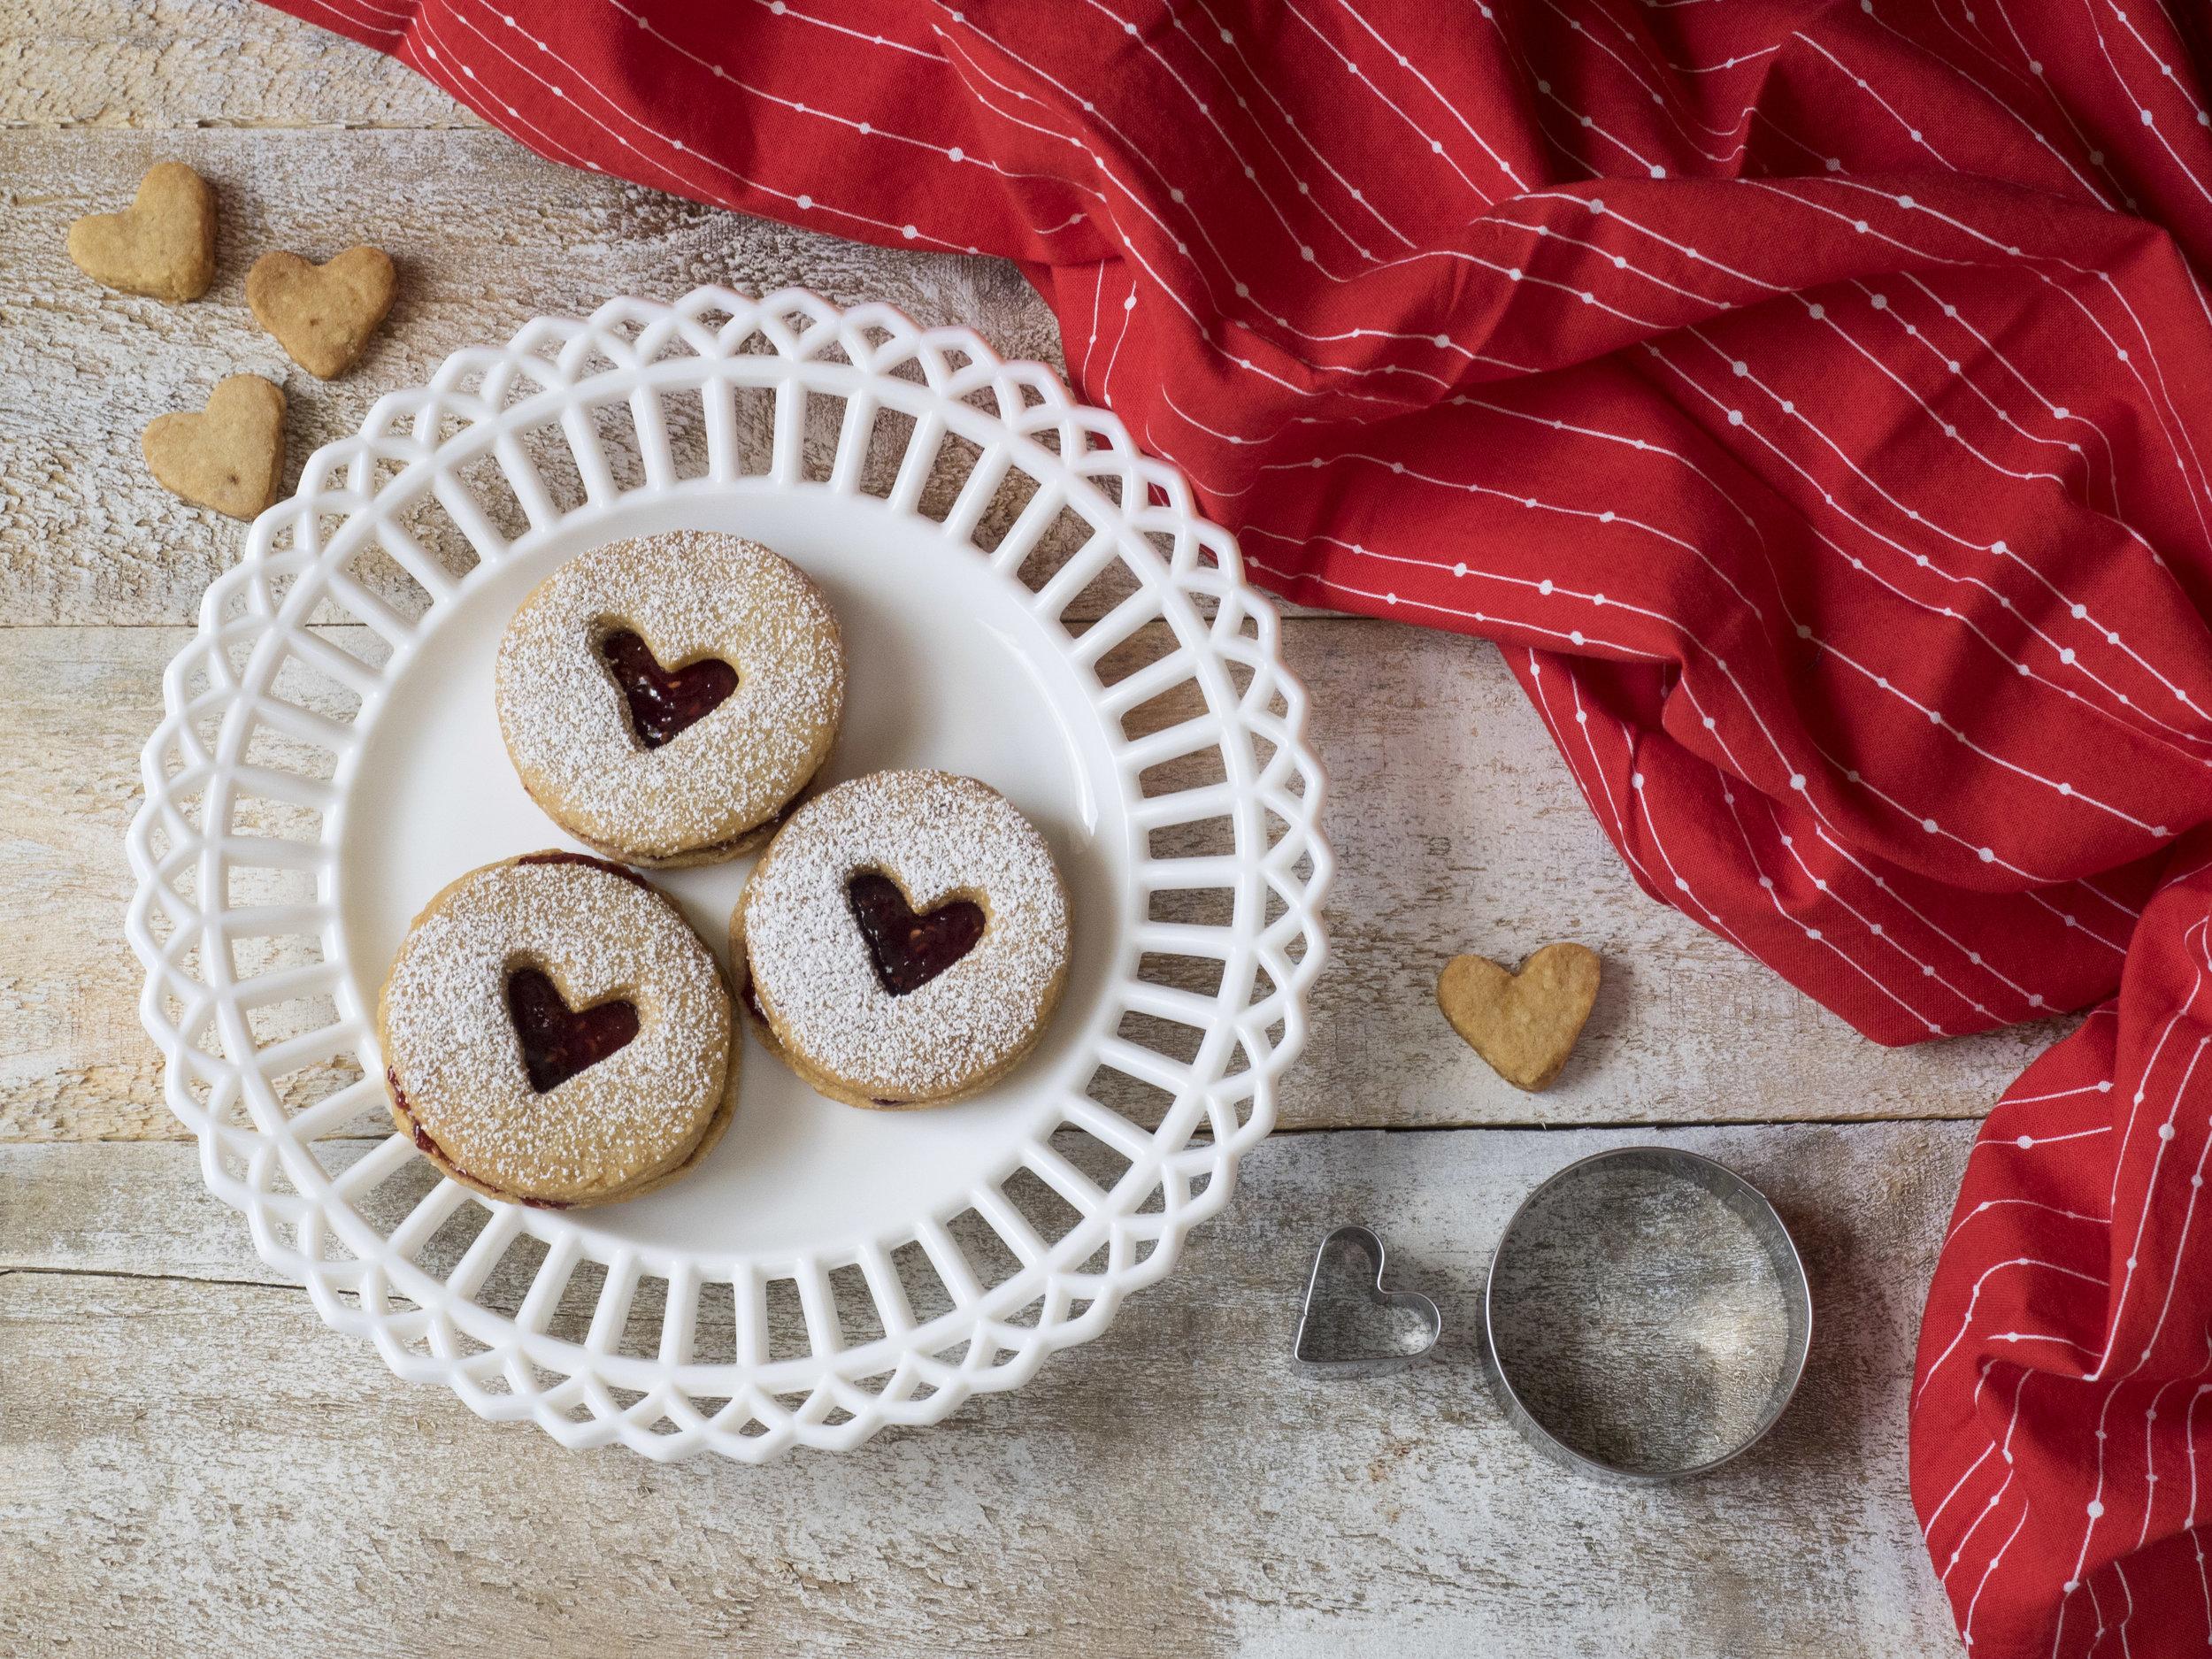 christmas linzer cookies overhead_PC220005_no watermark.jpg